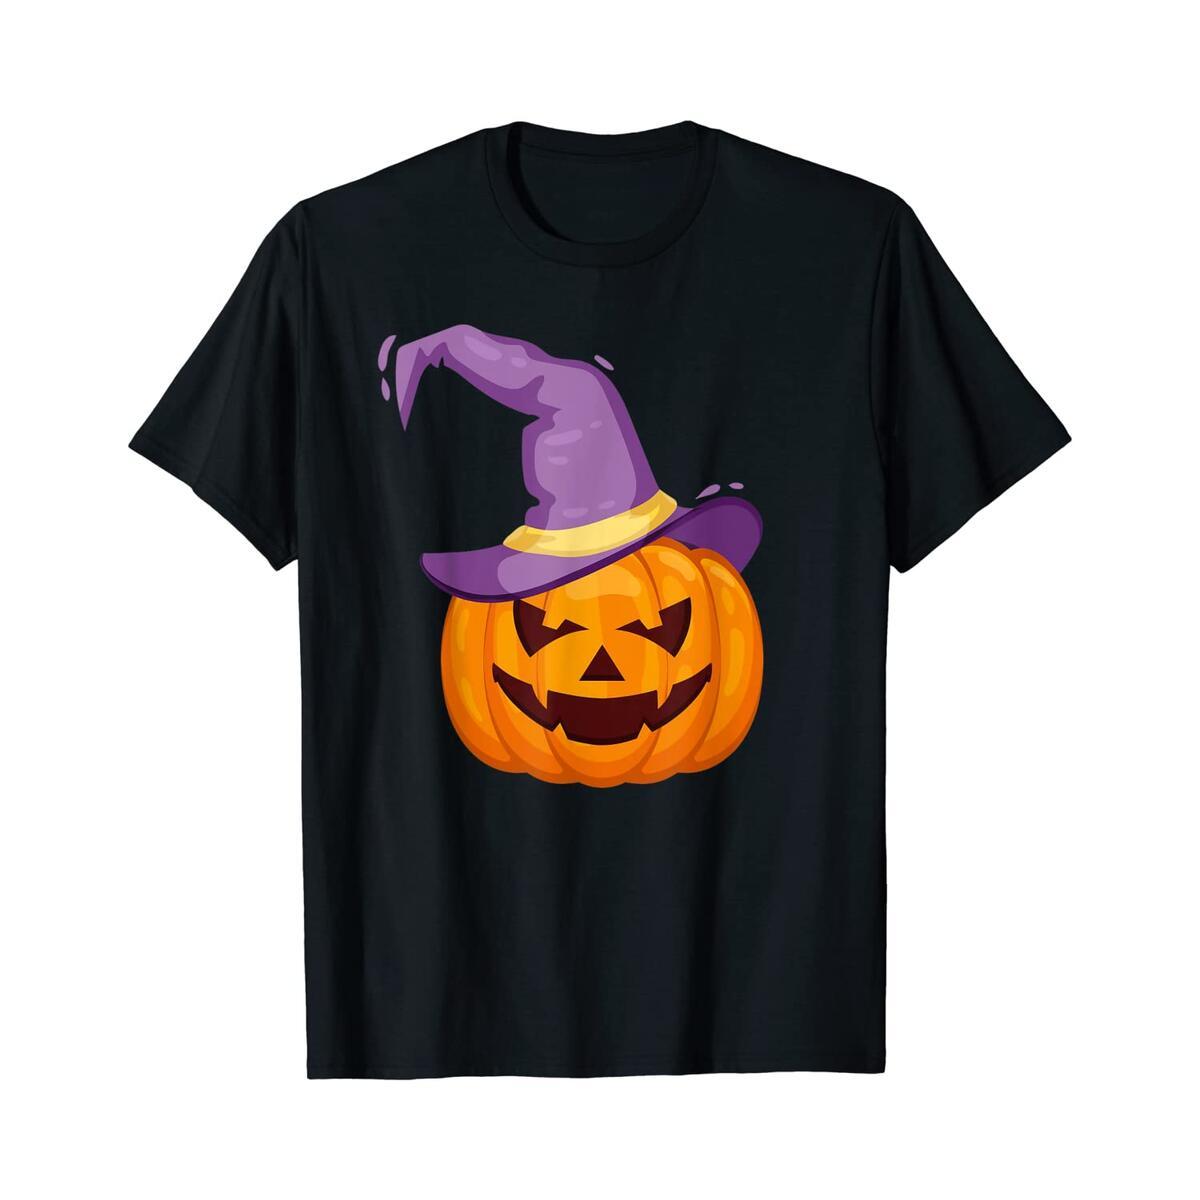 Halloween Funny Jackolantern Pumkin Witchy T-Shirt